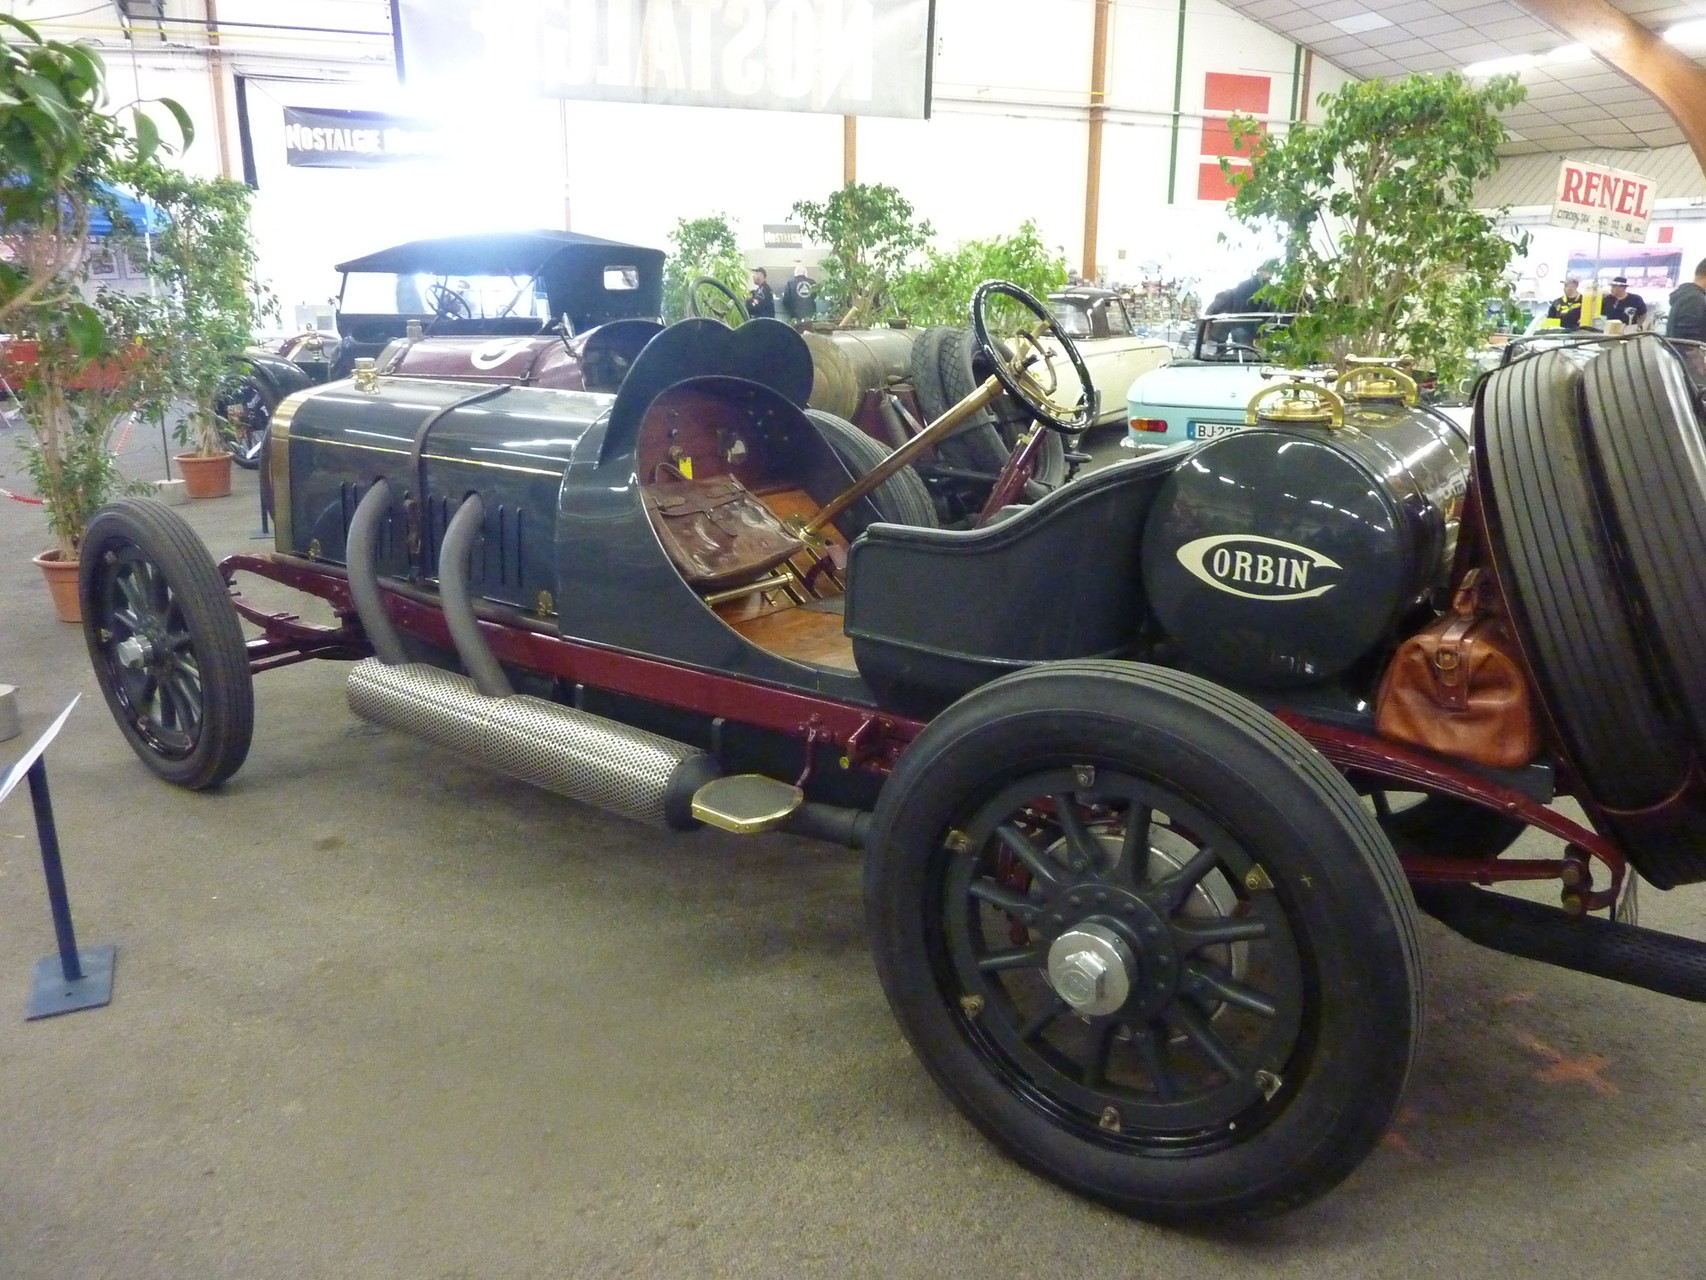 CORBIN 1907